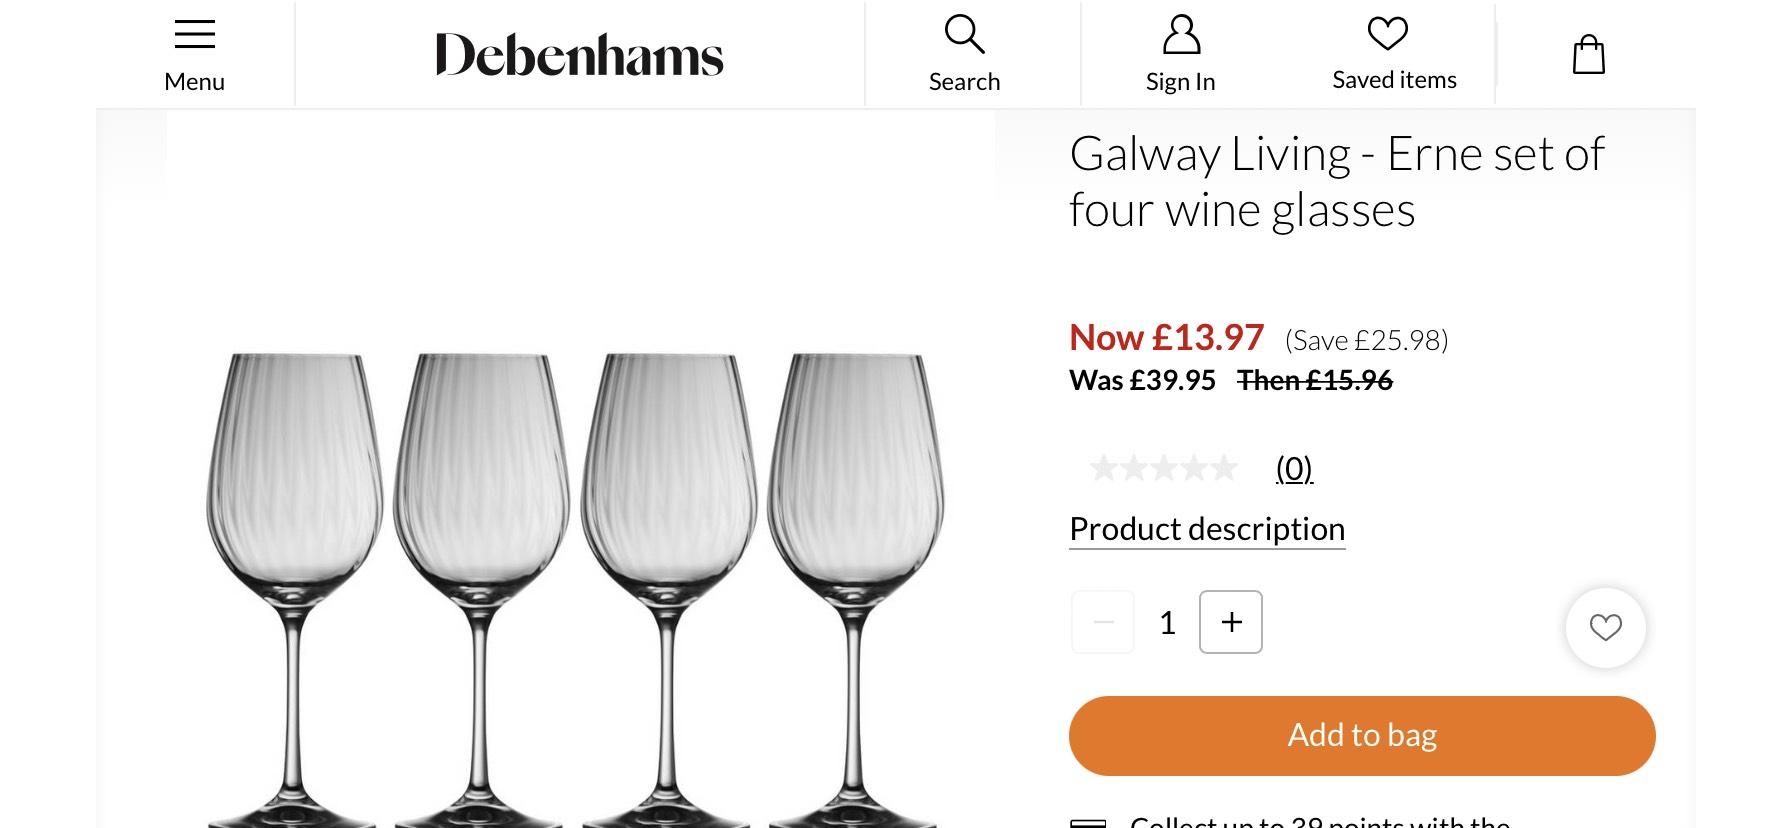 Debenhams - Galway Living - Erme Set of 4 Wine Glasses £17.46 delivered @ Debenhams